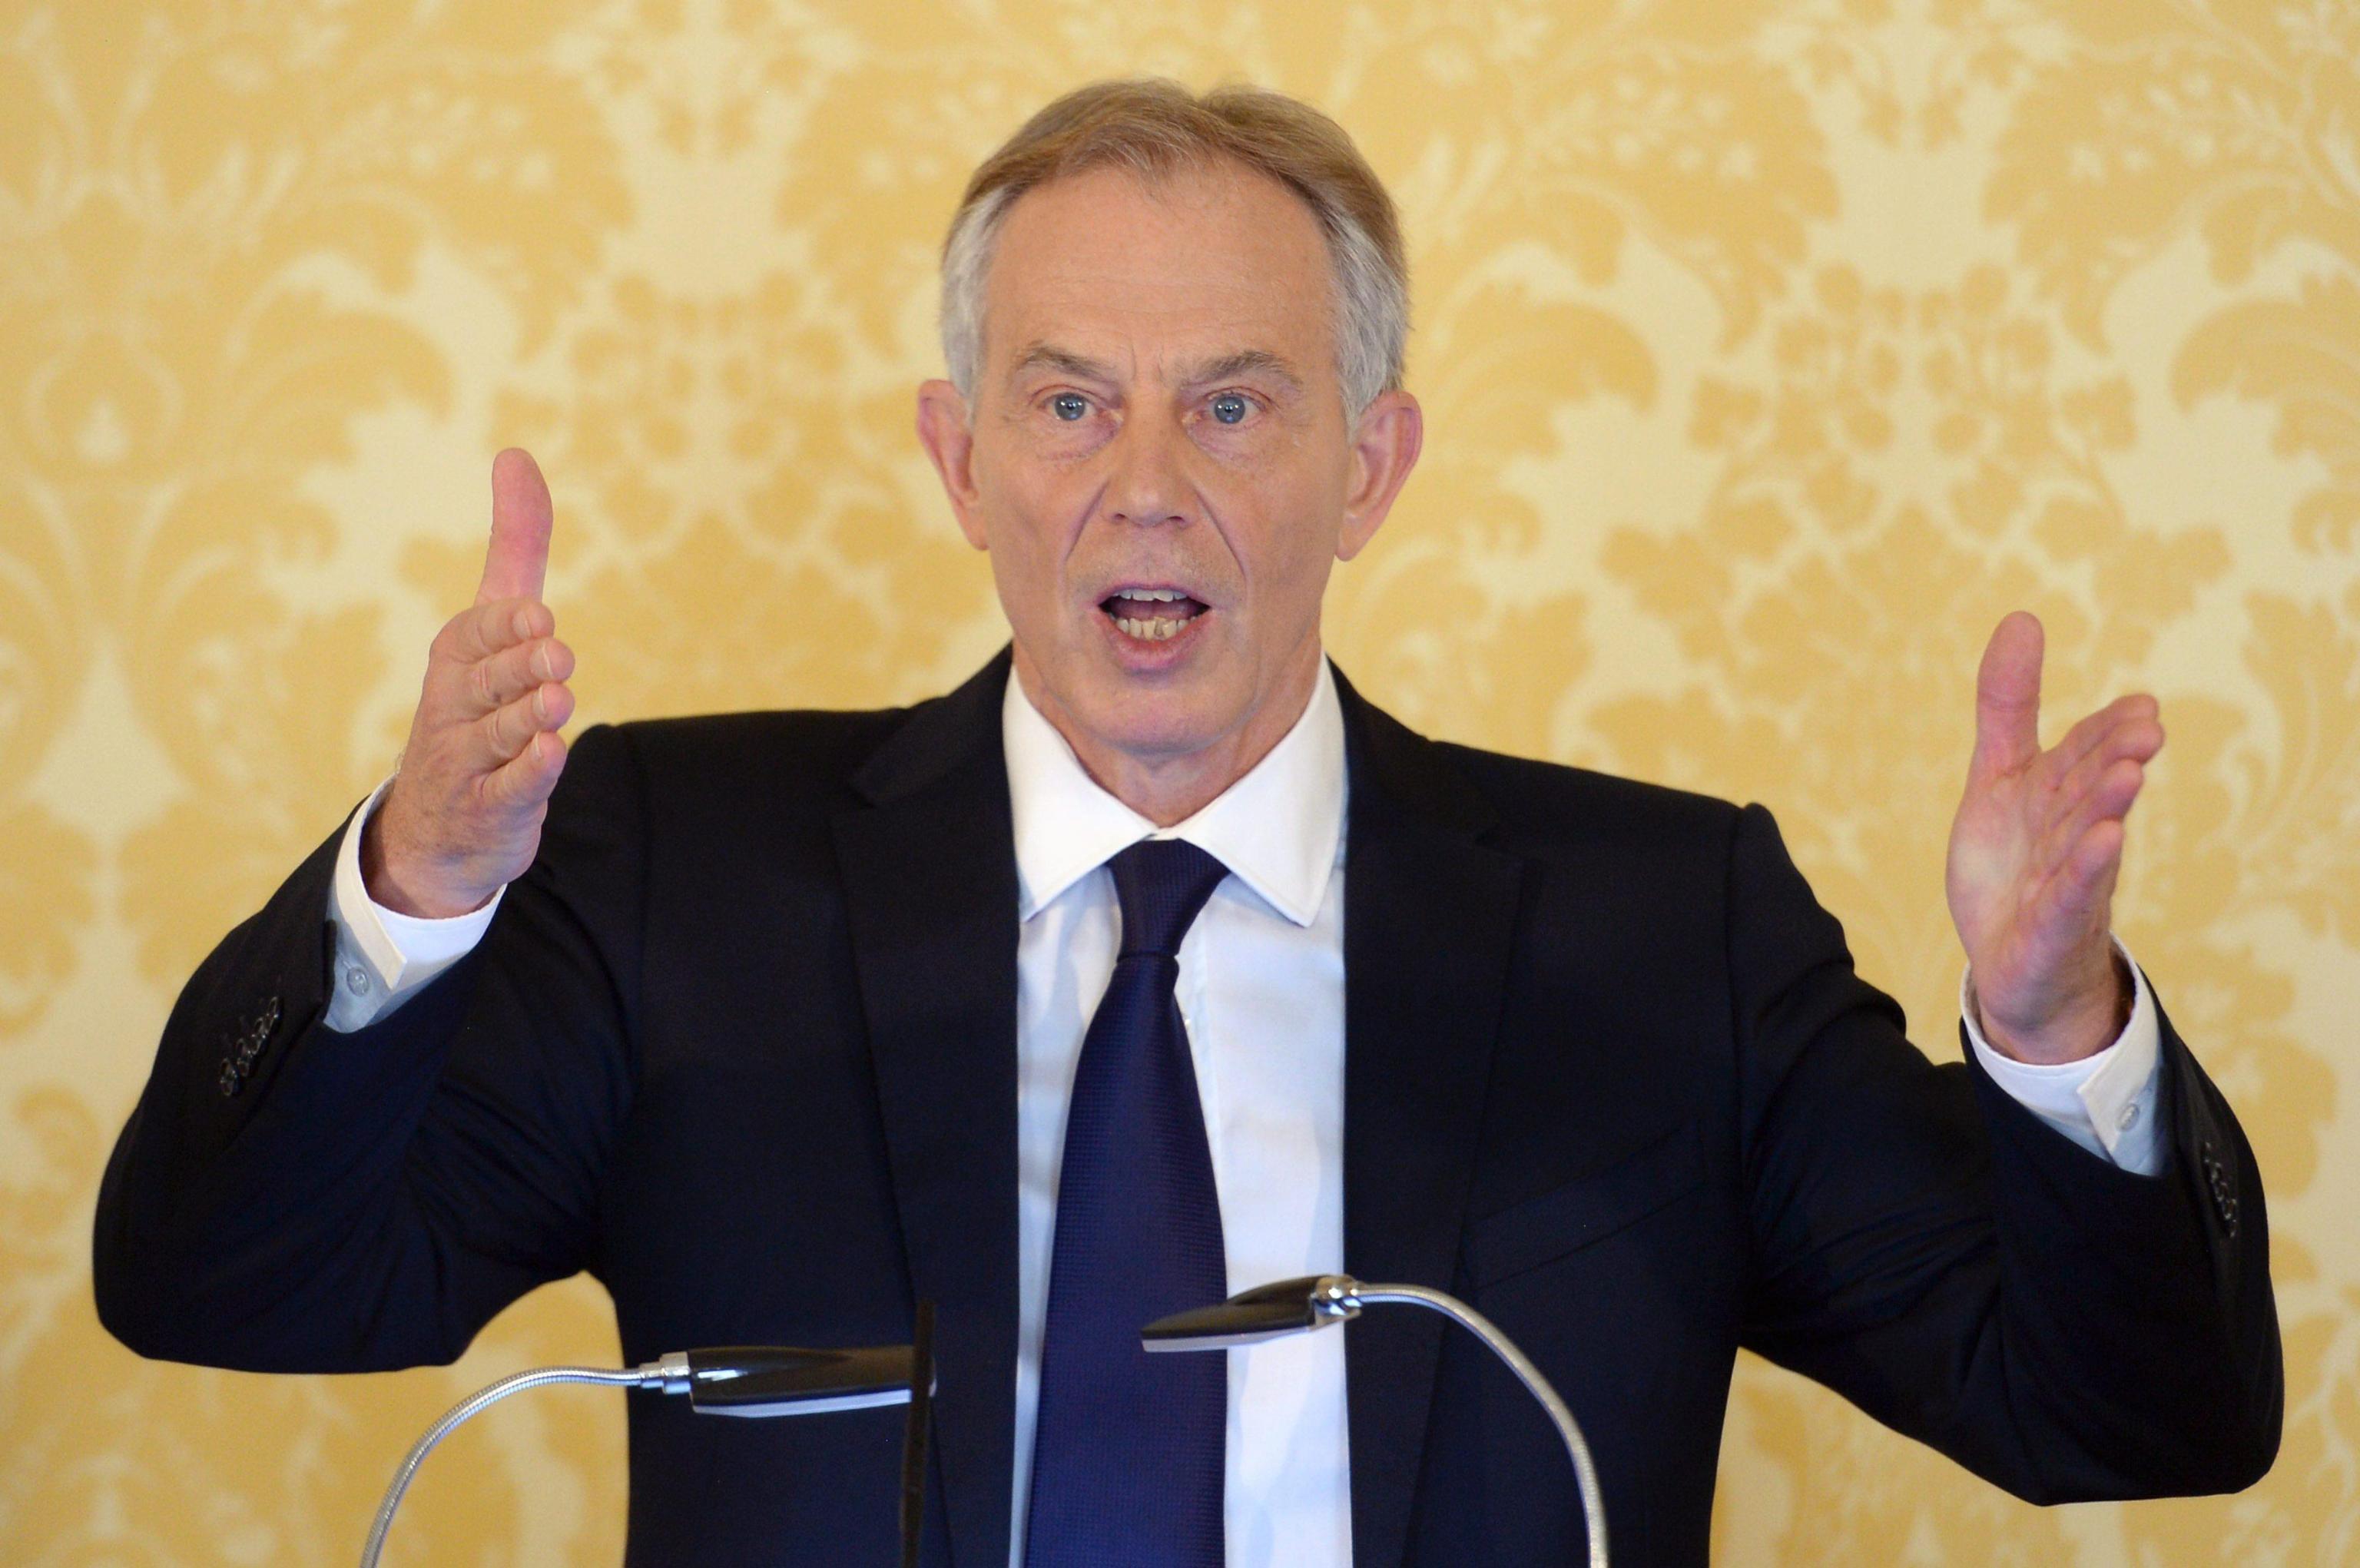 Former British Prime Minister Tony Blair responds to Chilcot Iraq inquiry